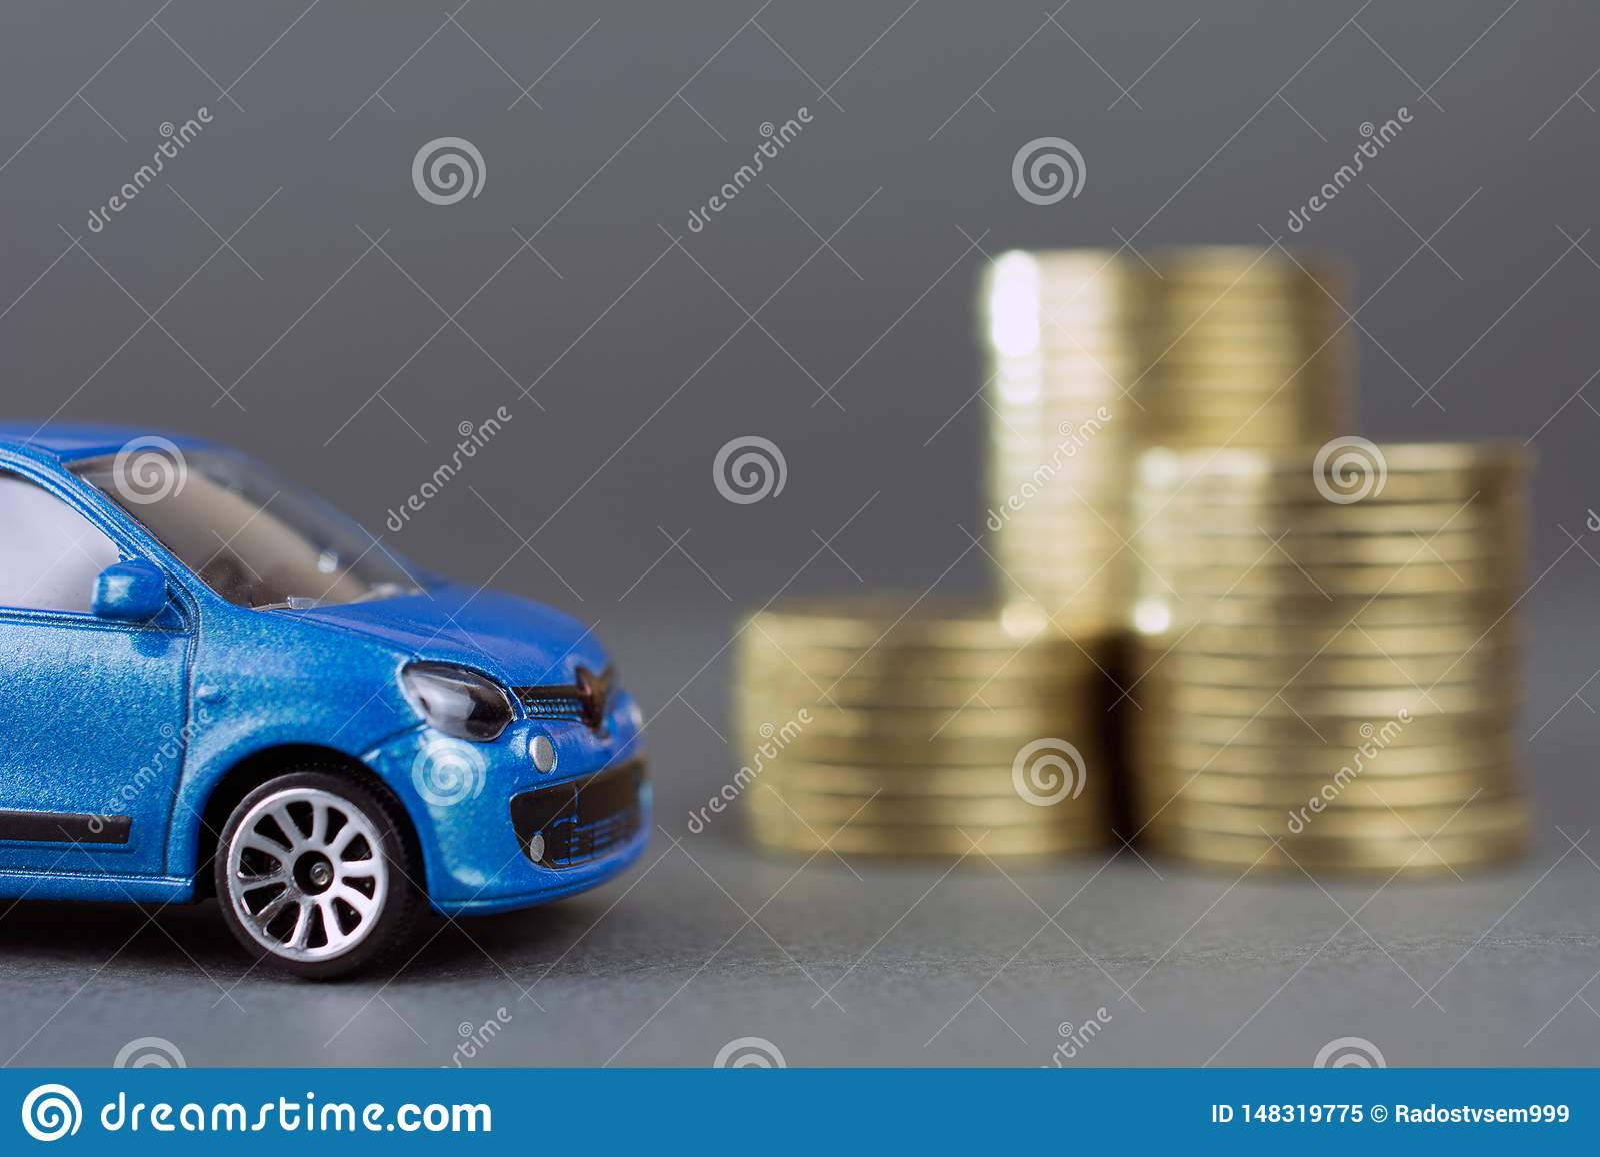 кредит урал банк реквизиты